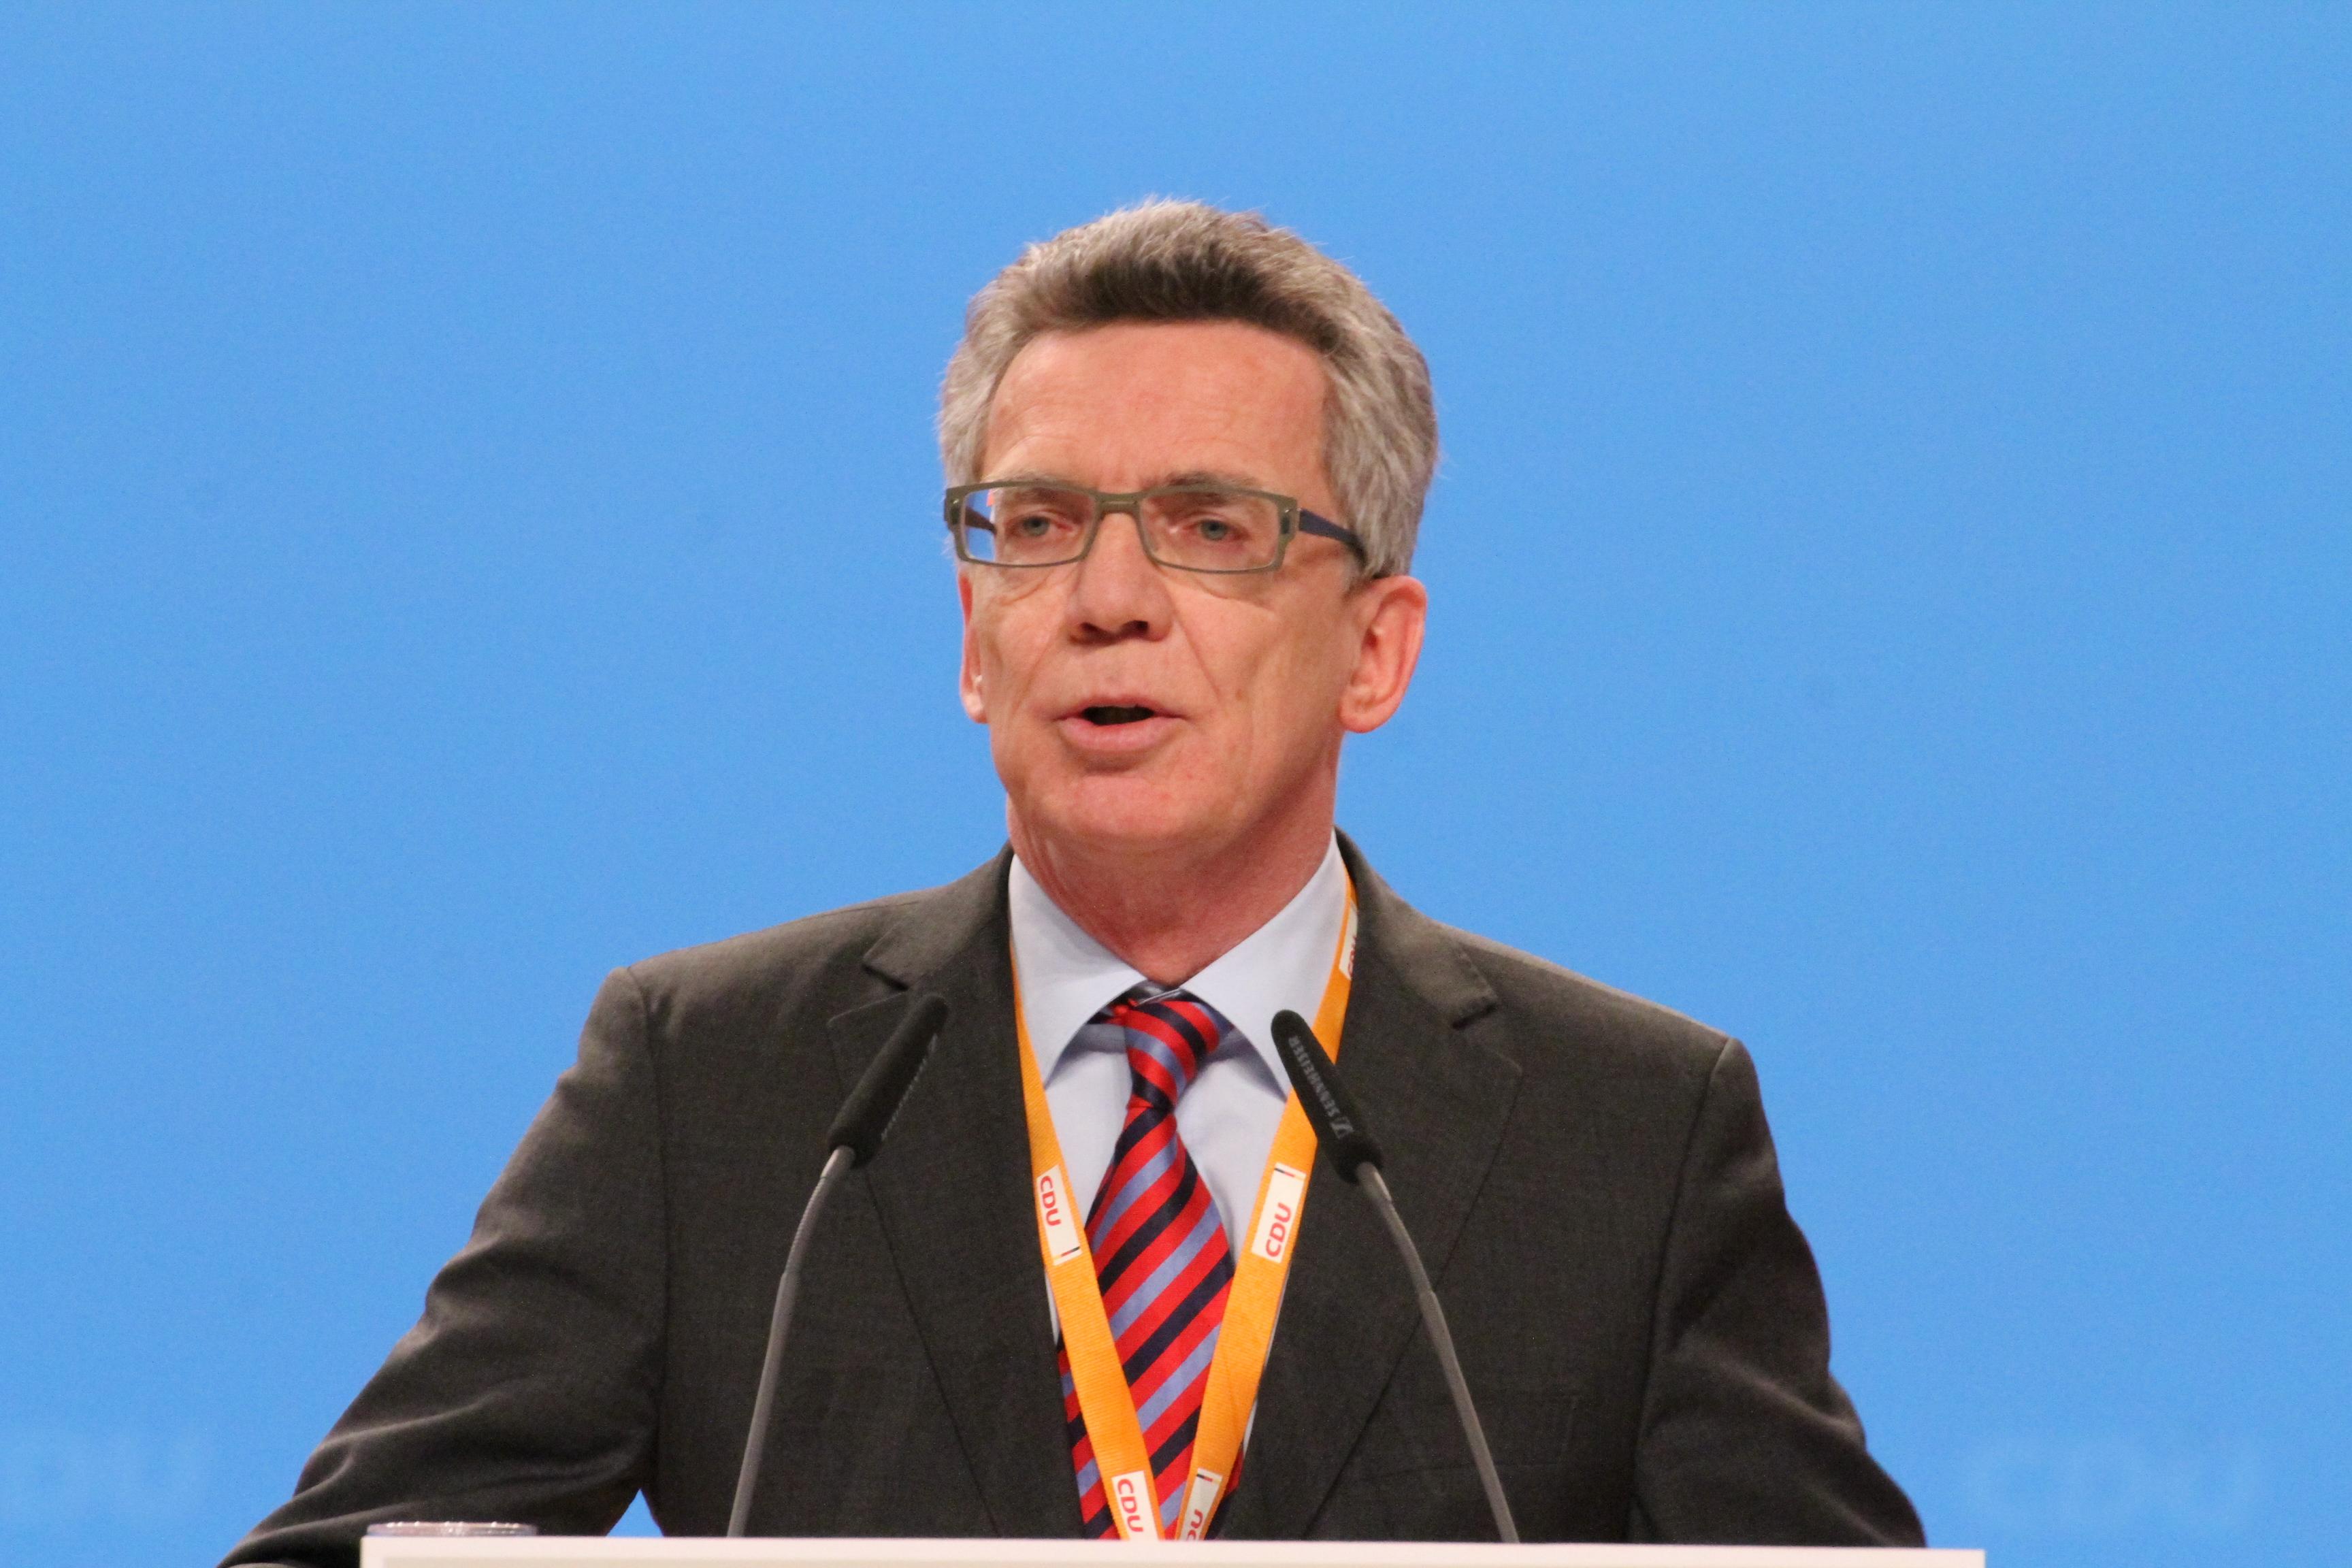 Thomas de Maizière Bildquelle: Olaf Kosinsky / Wikipedia